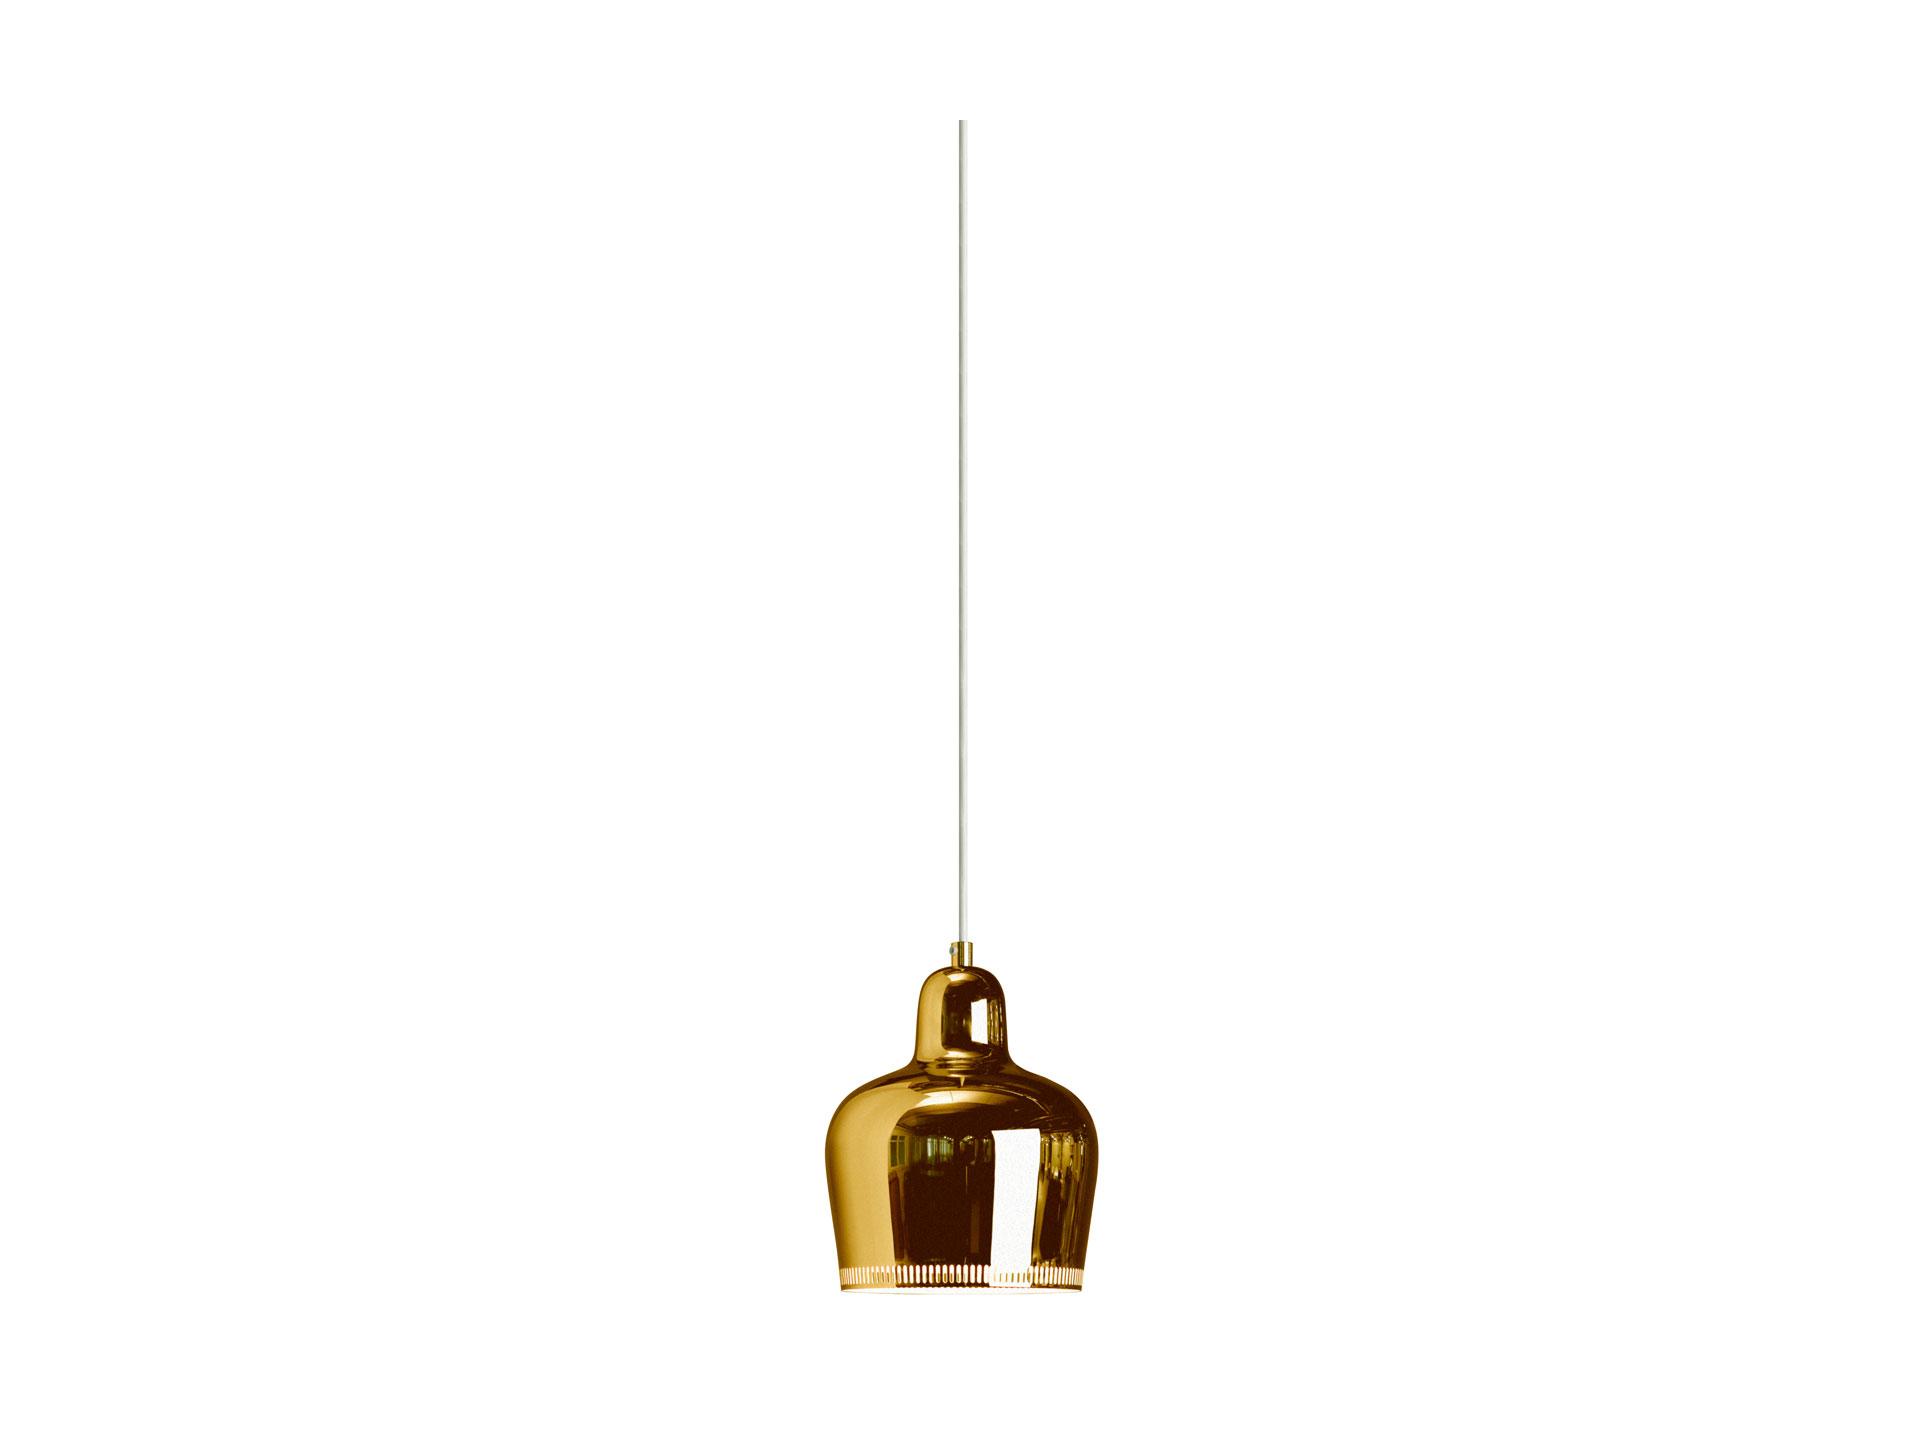 Alvar-Aalto-Golden-Bell